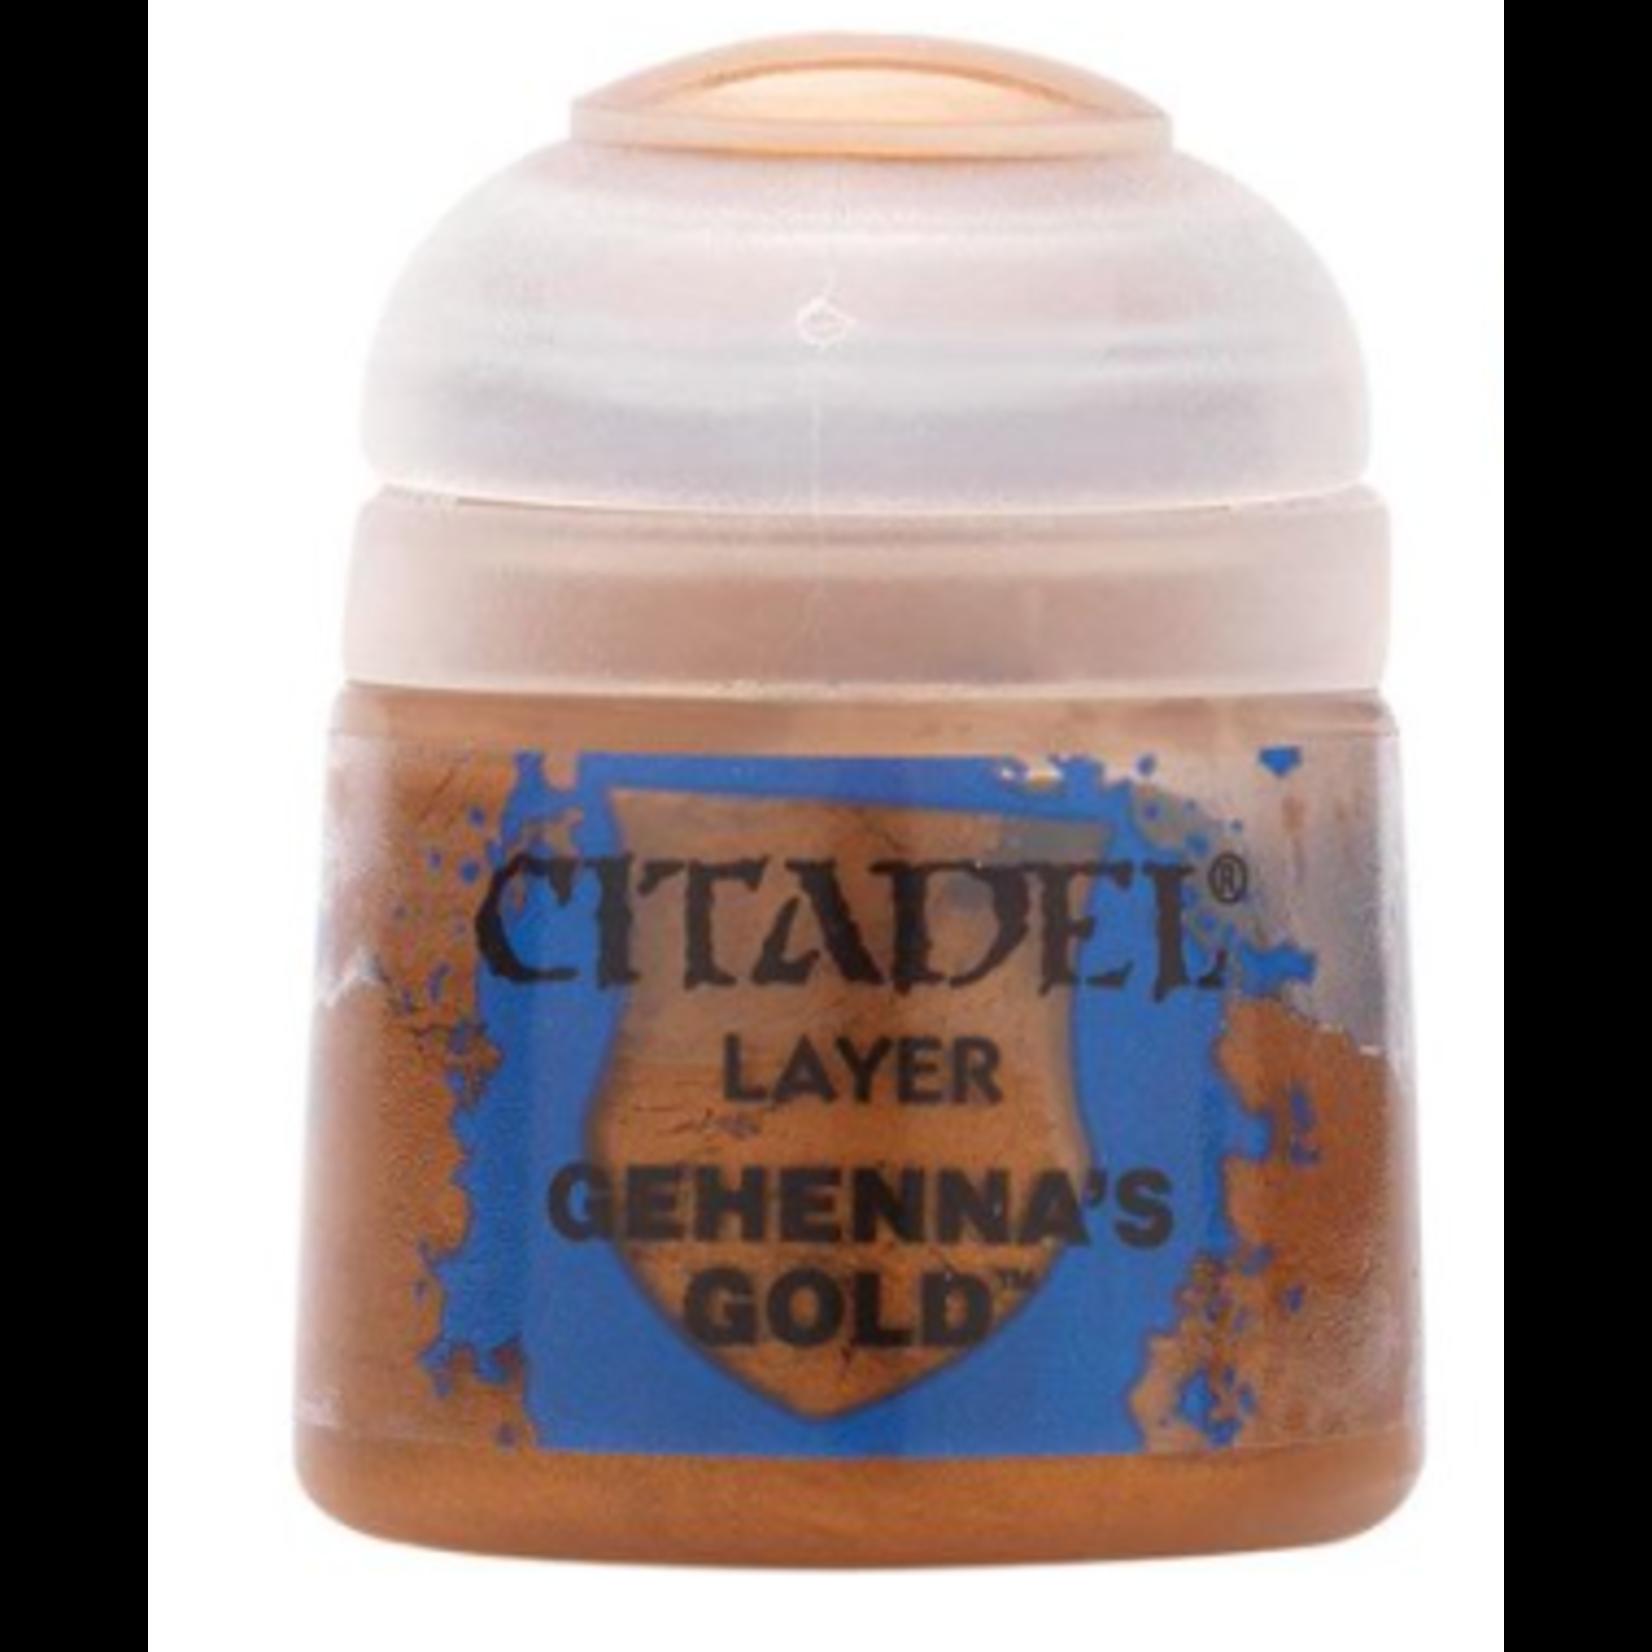 Games Workshop Citadel Paint: Gehenna's Gold 12ml